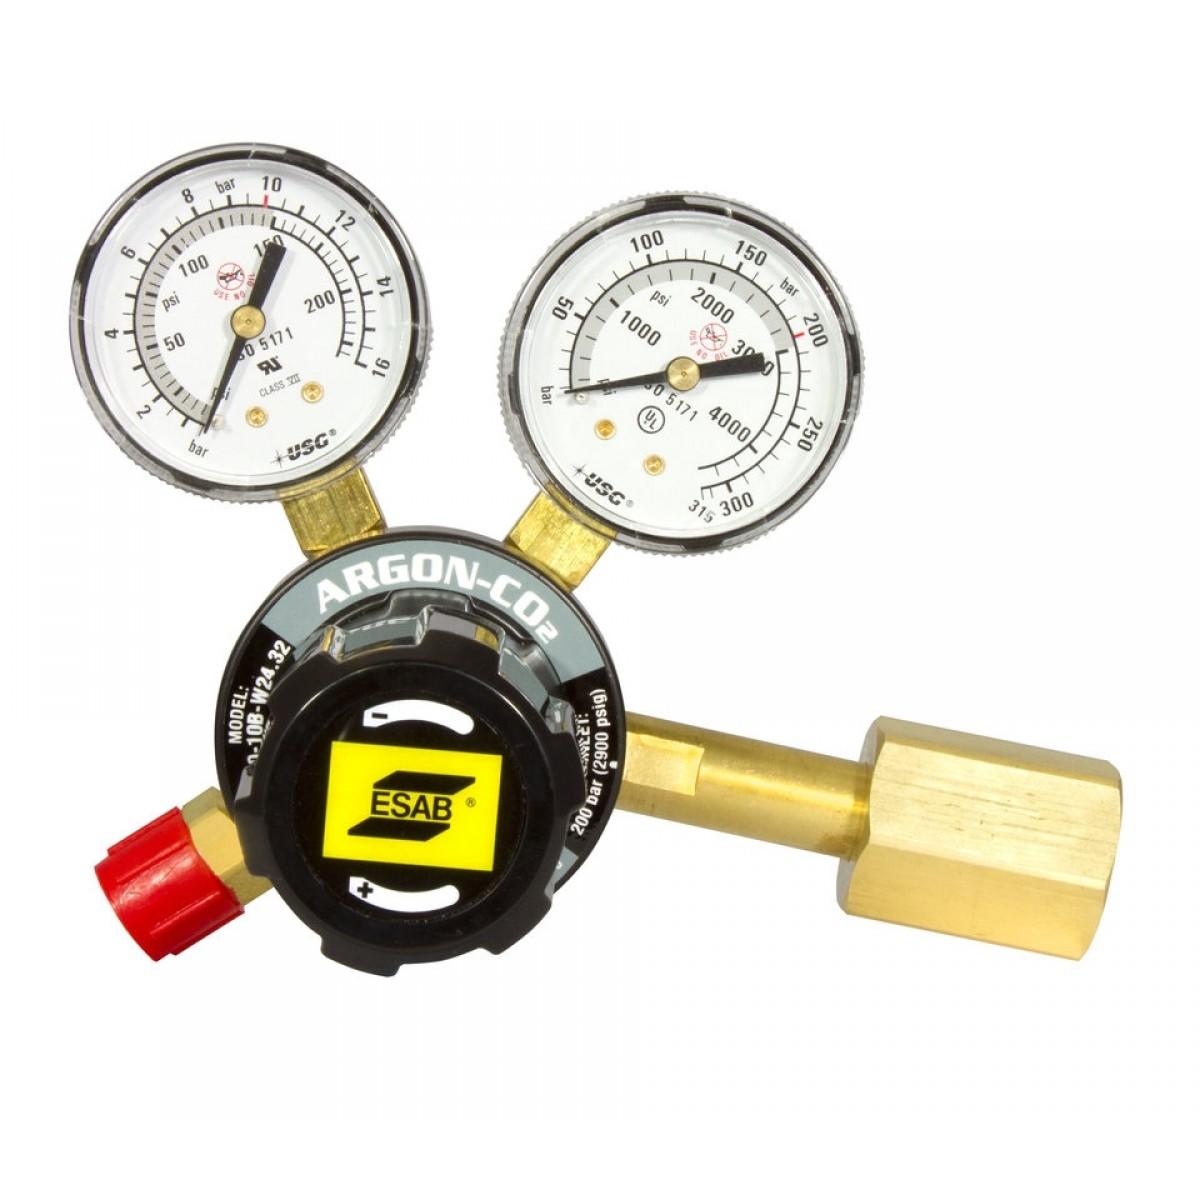 Esab Reduktionsventil Argon/CO2 Sort-31